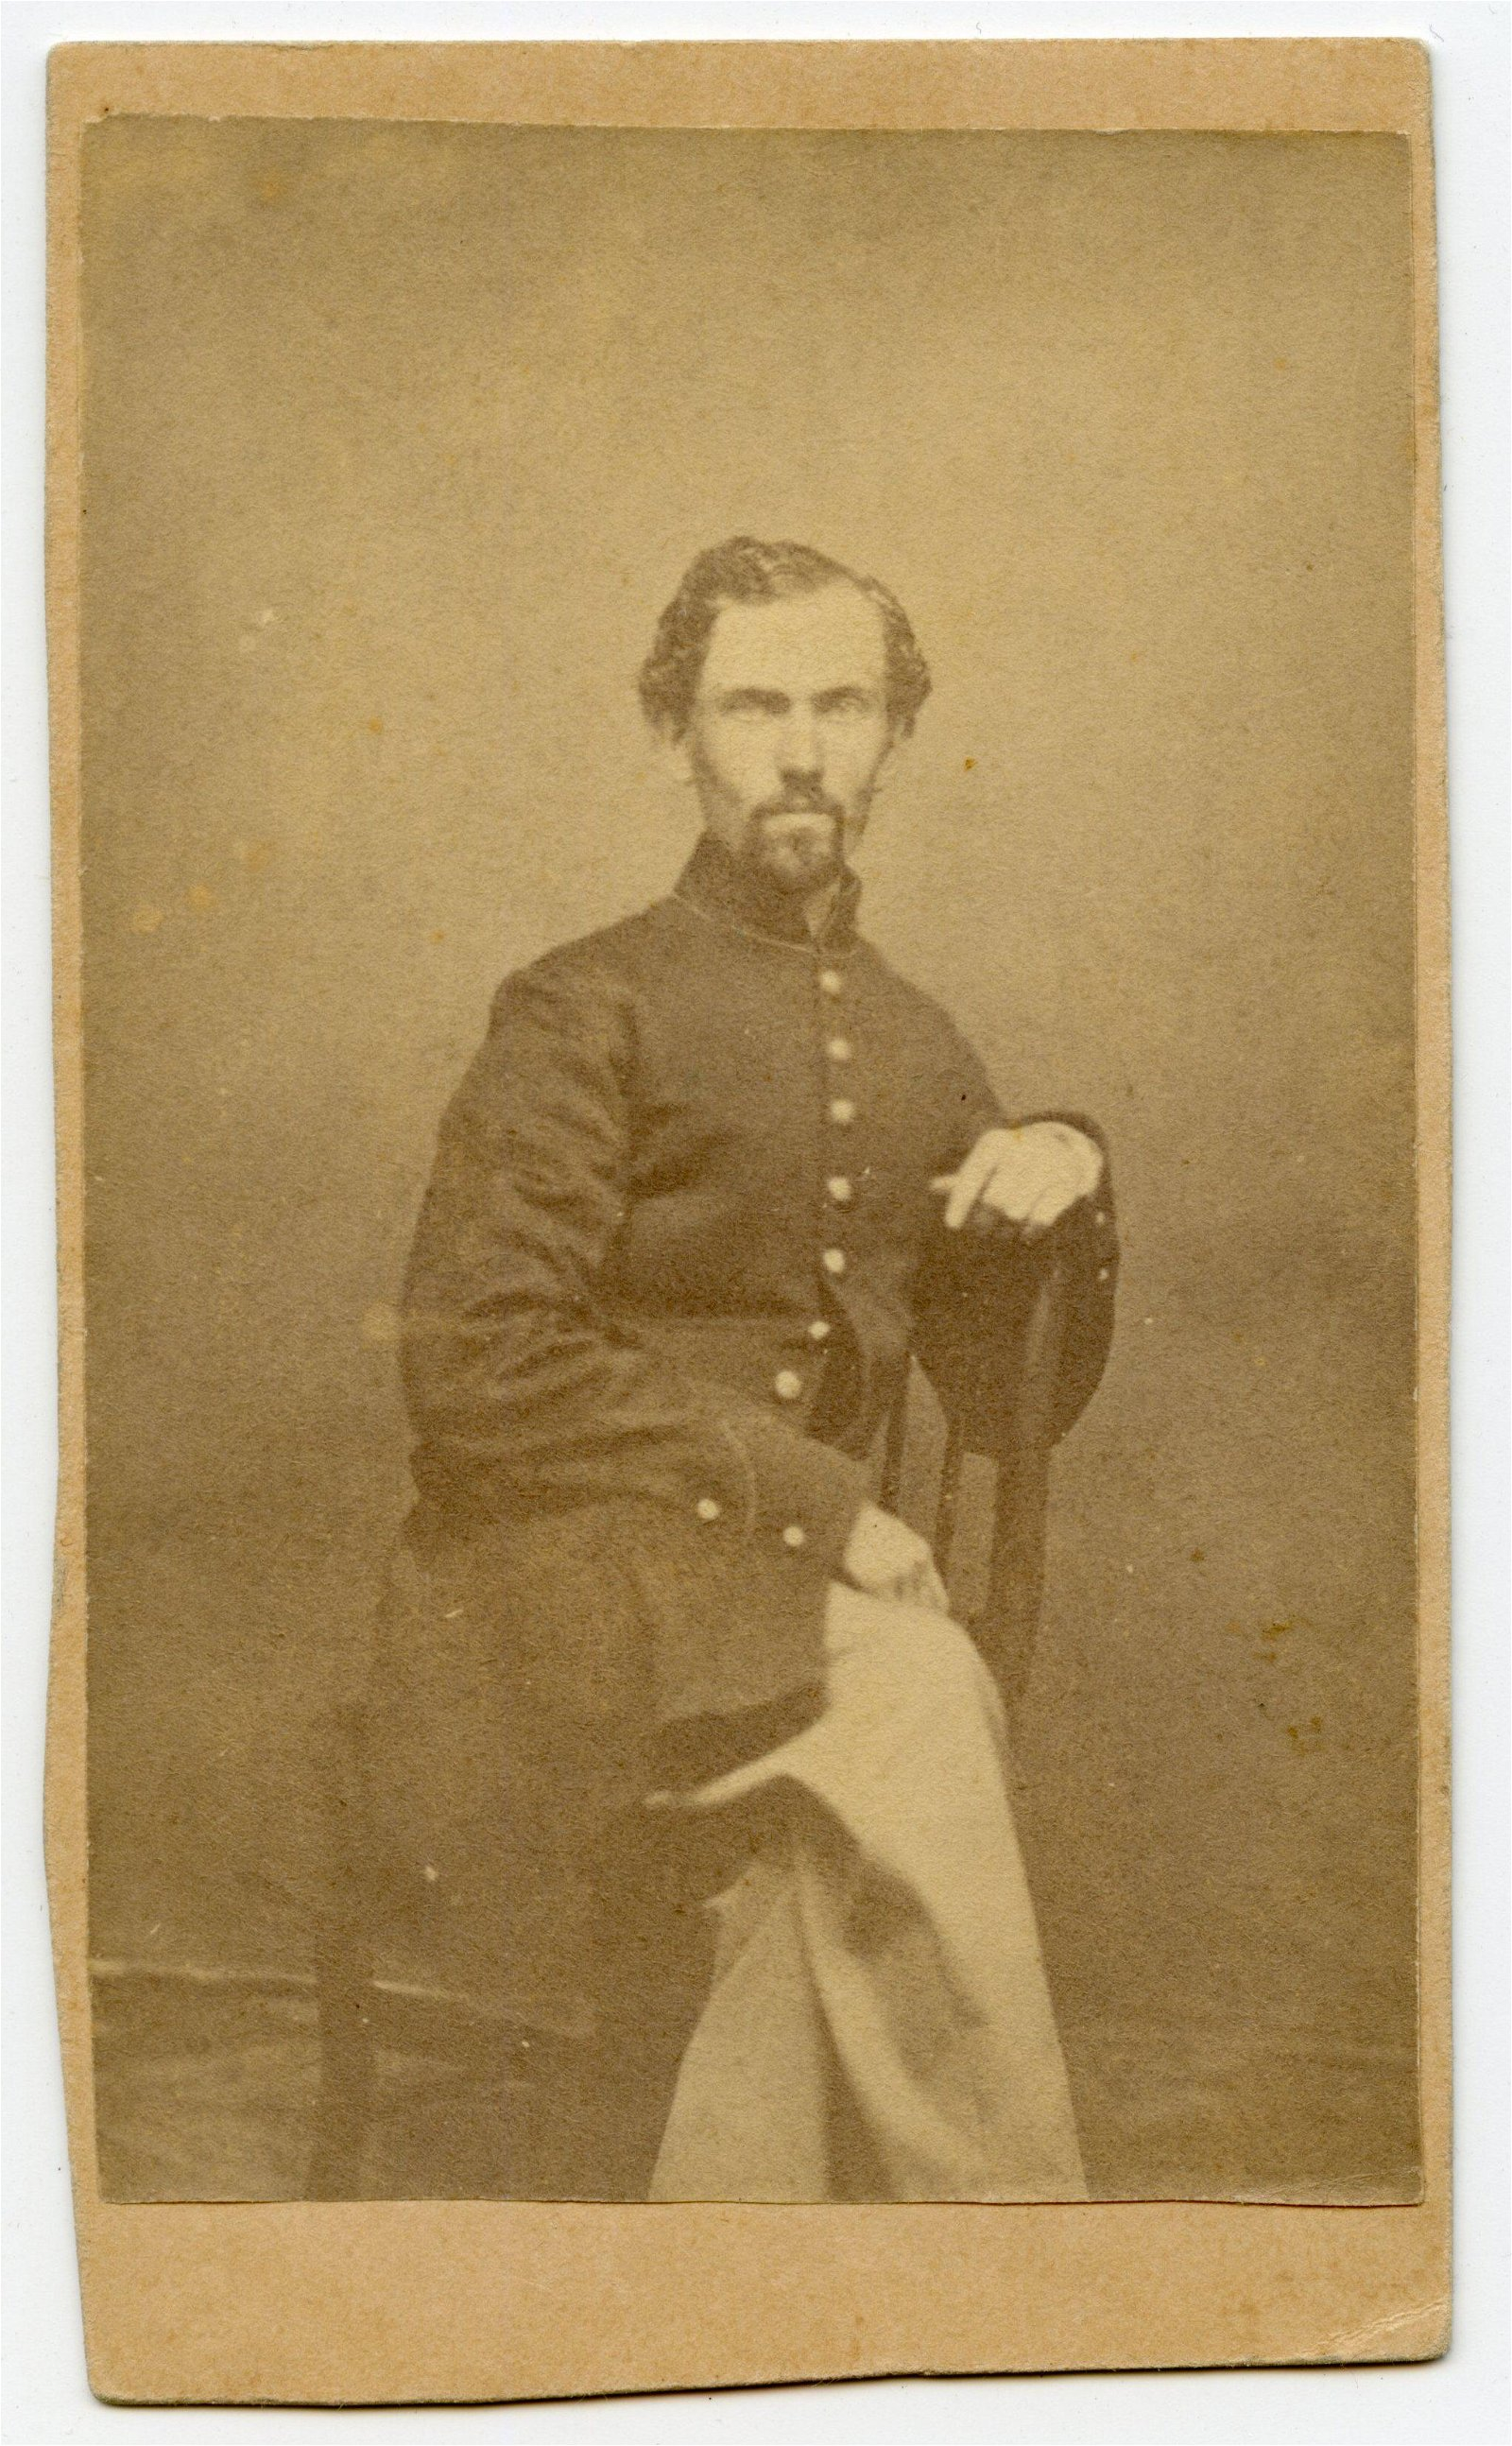 Civil War CDV- Possibly 16th Illinois Infantry